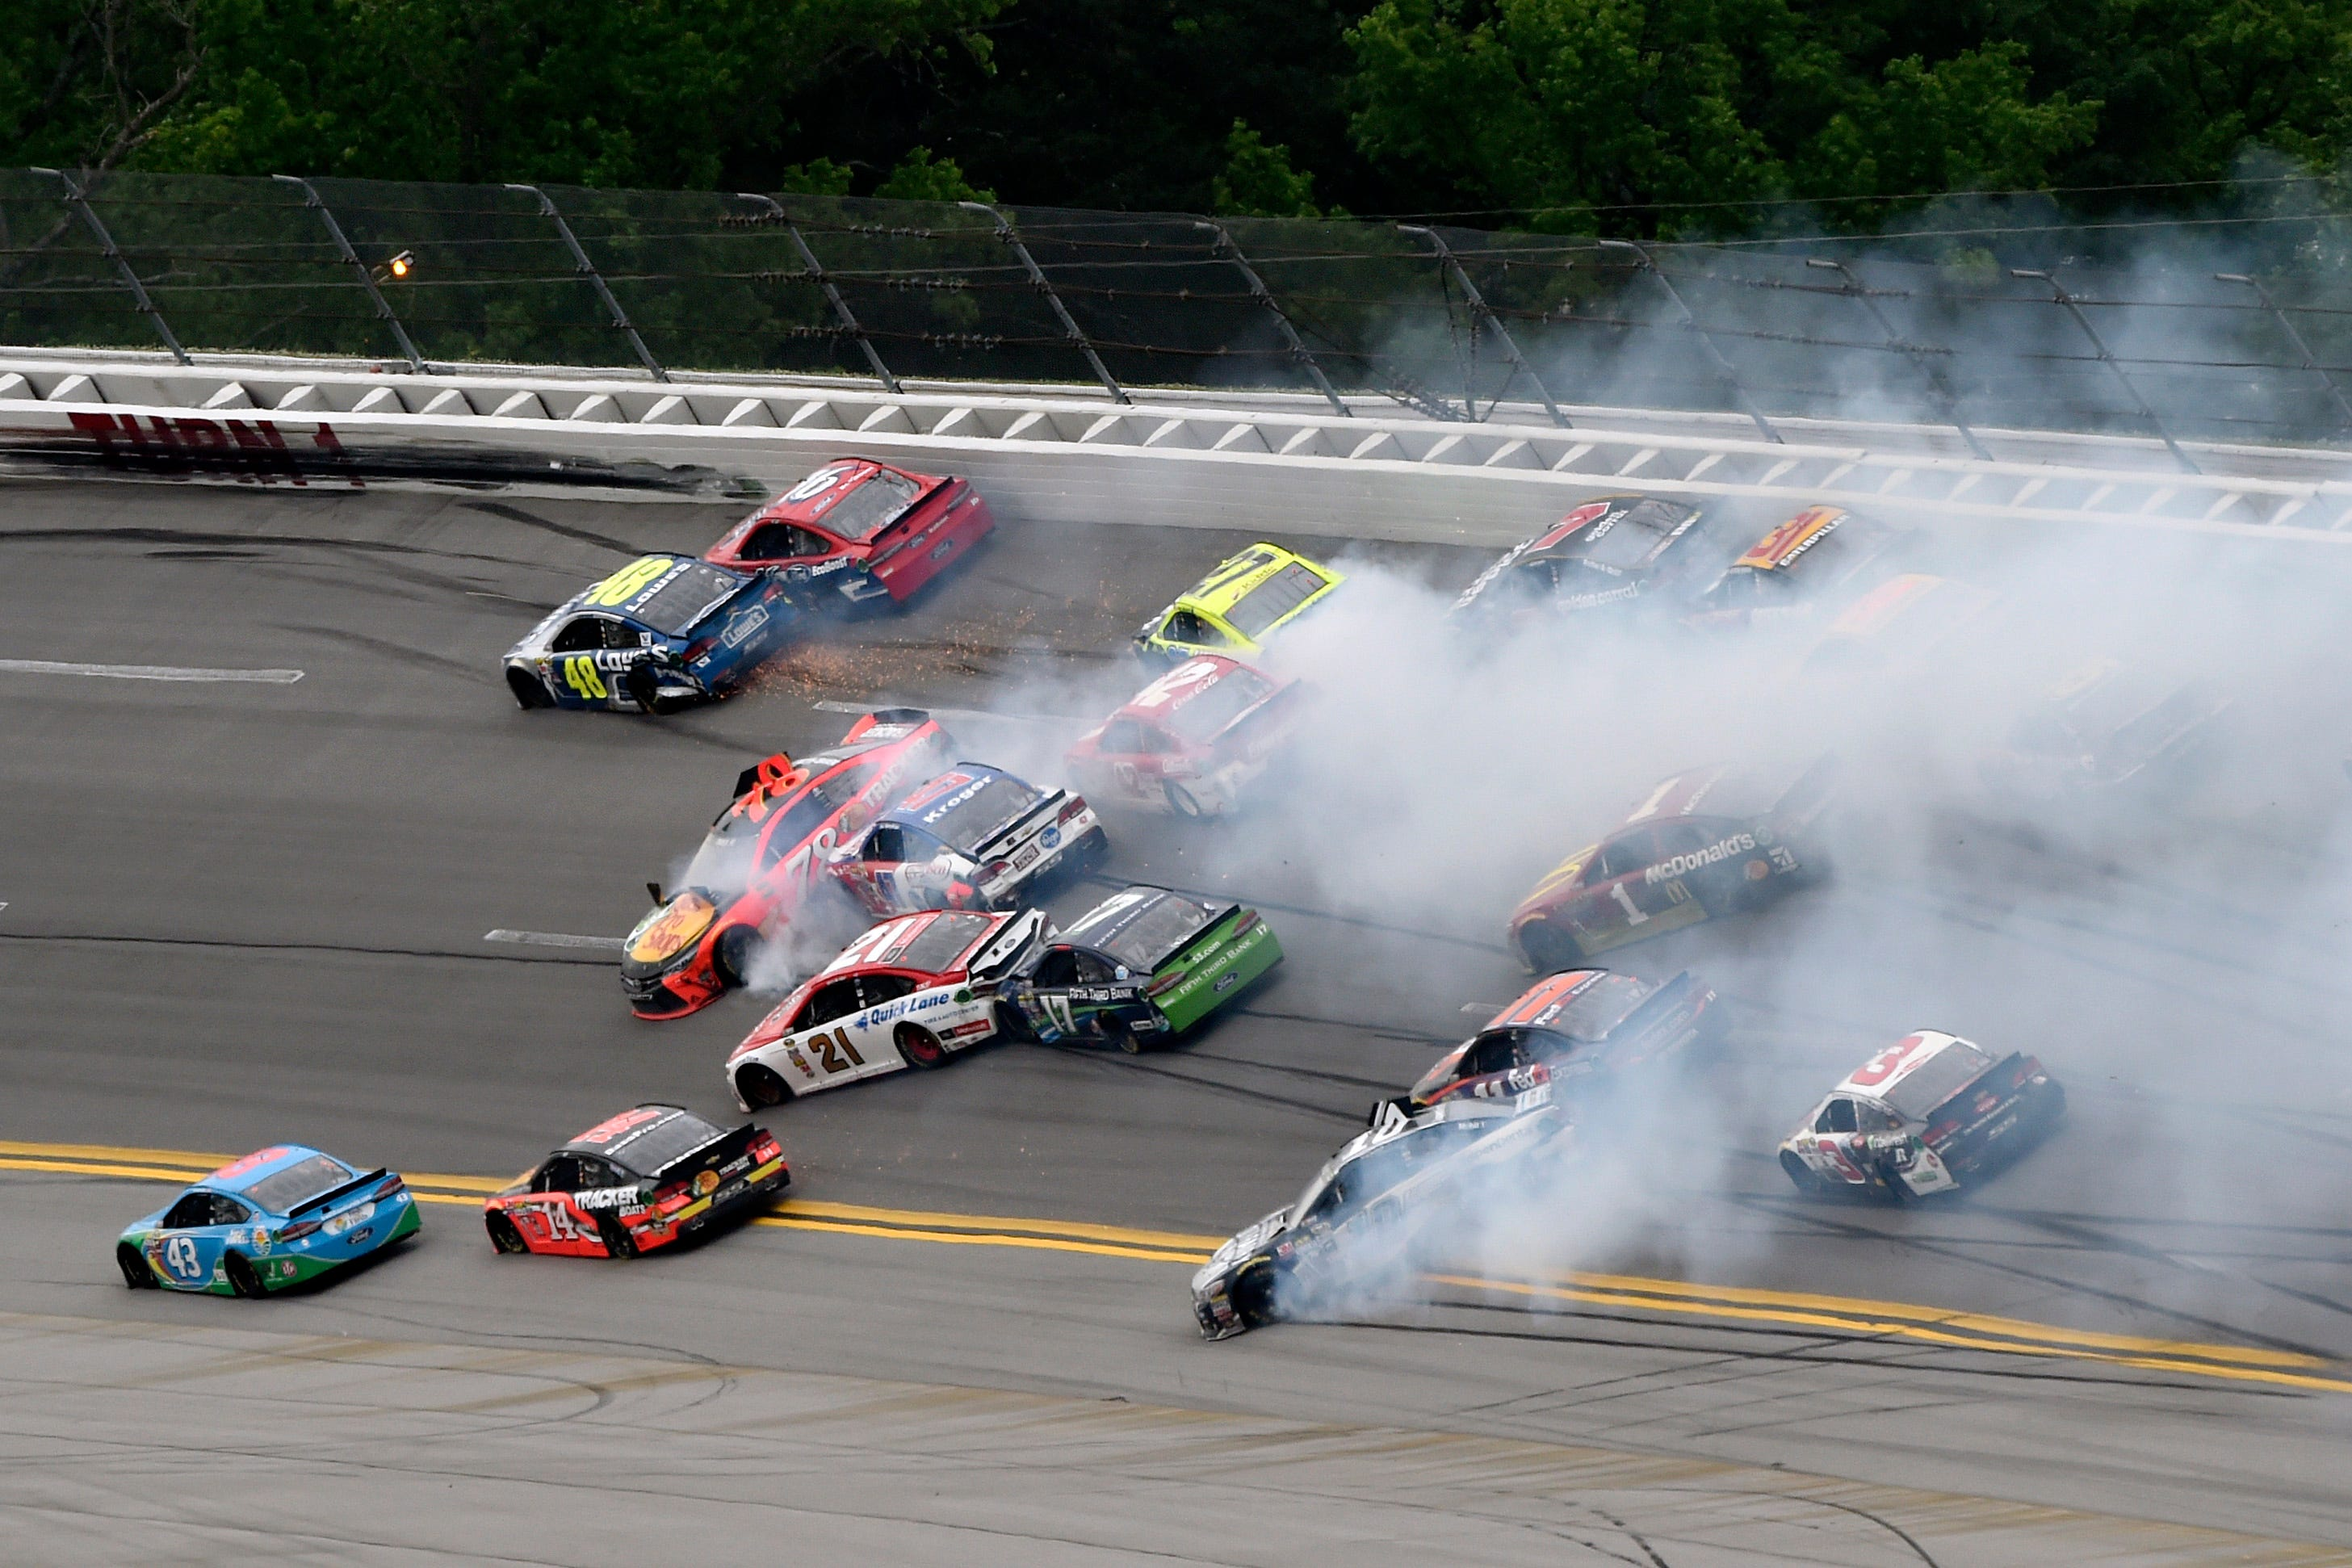 2016 NASCAR Daytona Sprint Unlimited HARD CRASH - YouTube